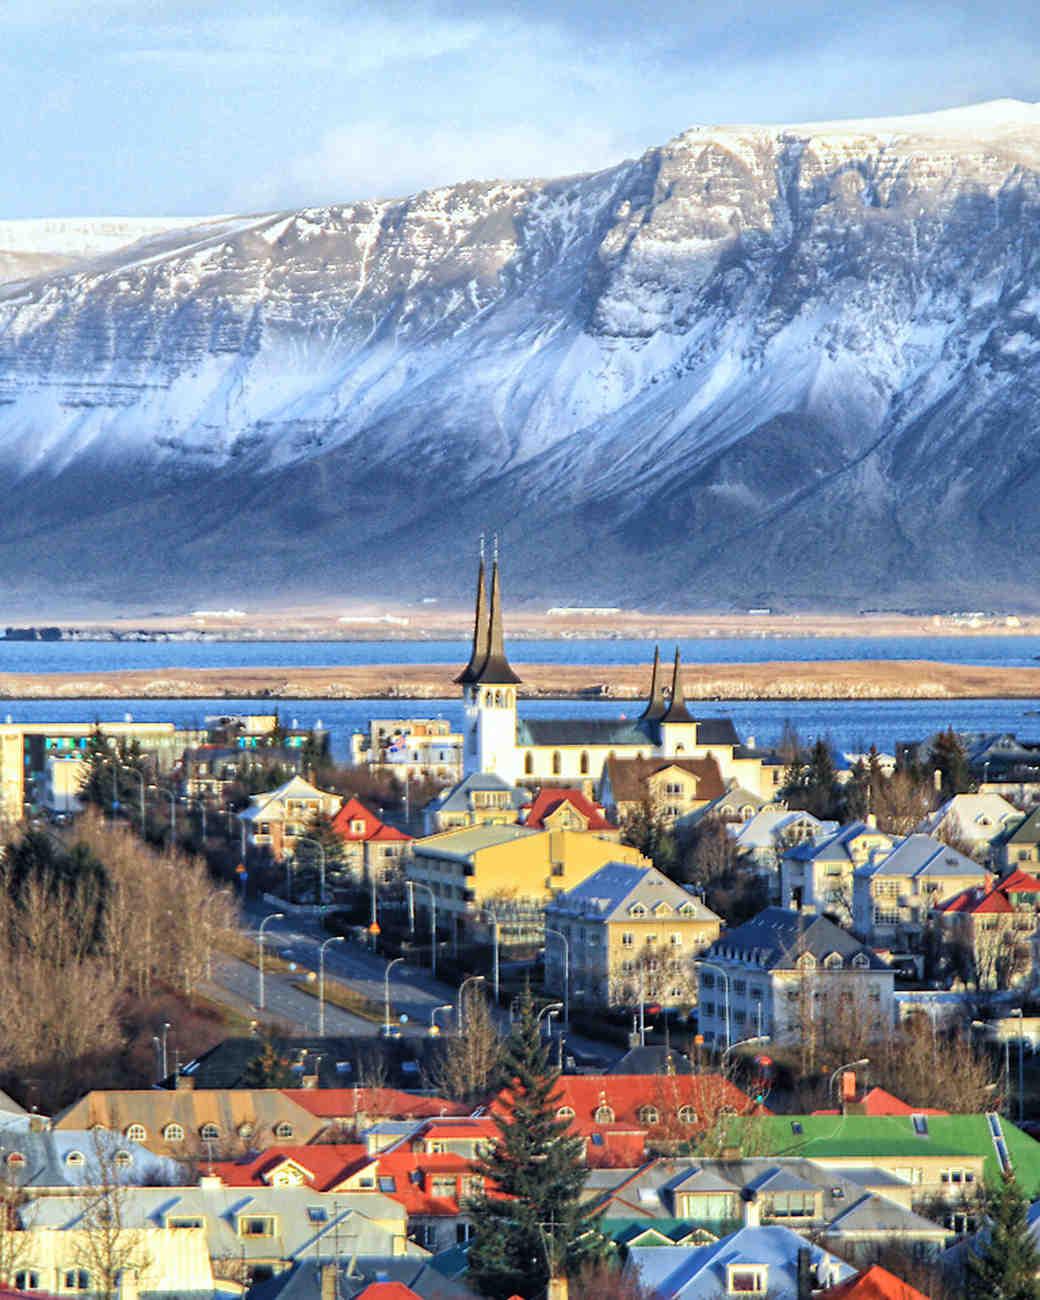 Reykjavik, Iceland City Center